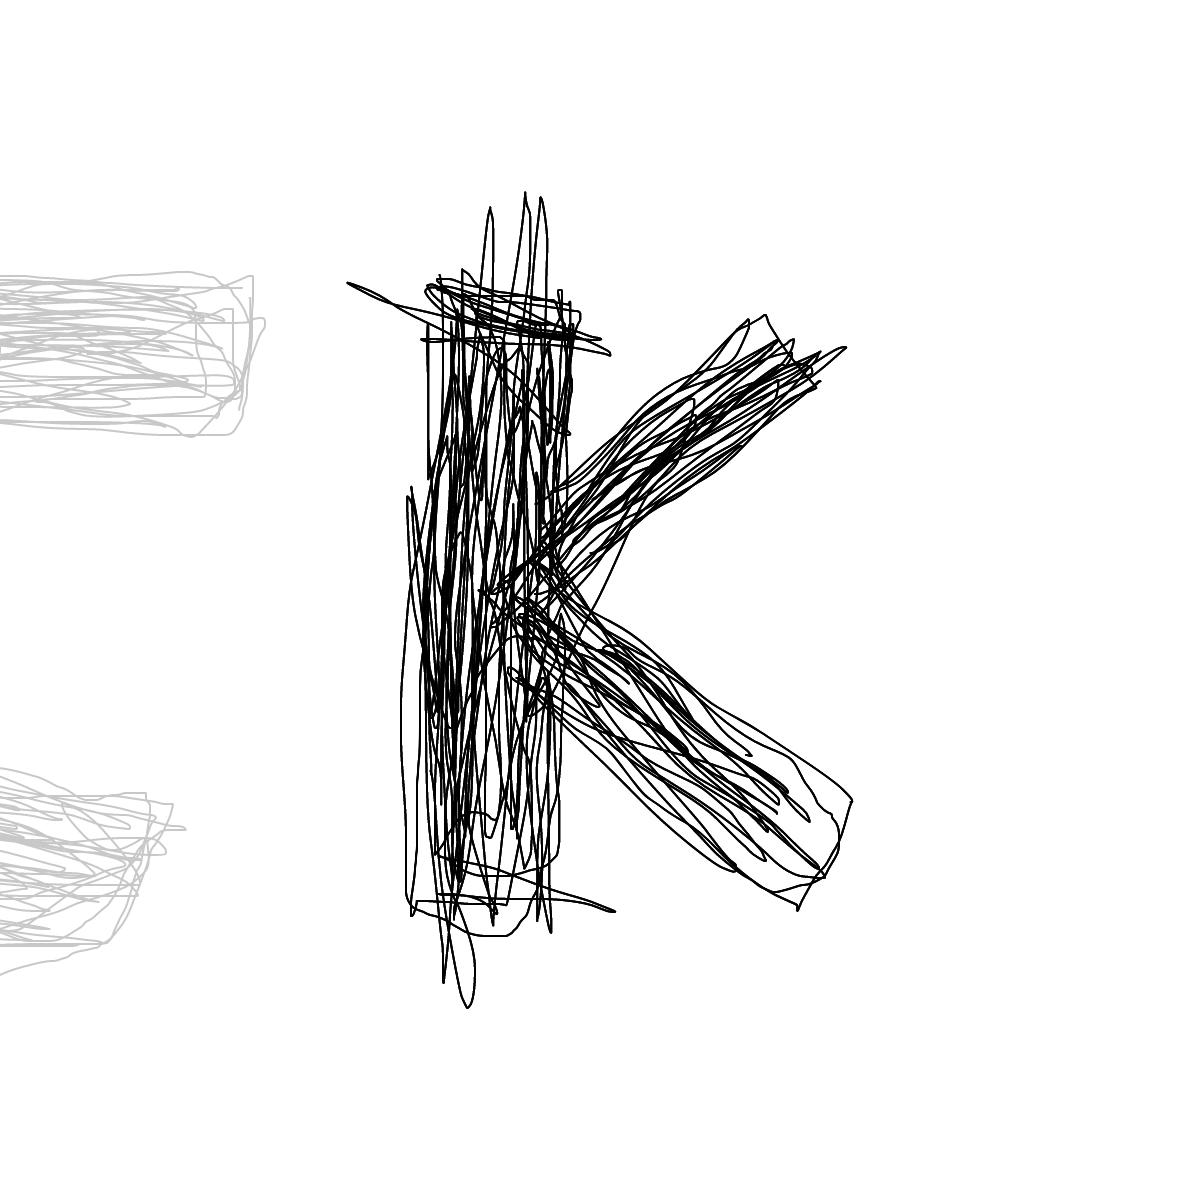 BAAAM drawing#24645 lat:52.4757537841796900lng: 13.4057111740112300